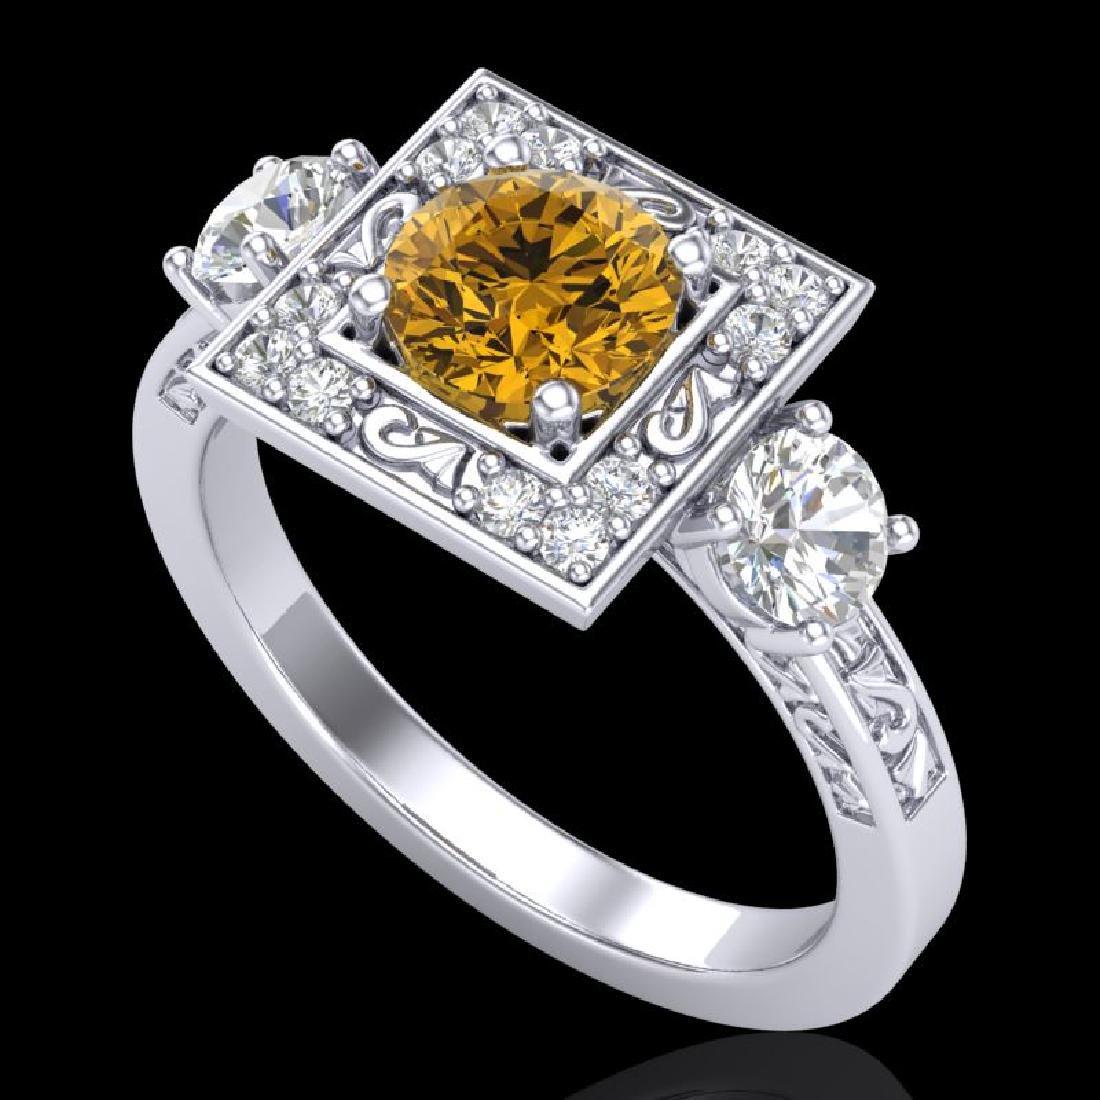 1.55 CTW Intense Fancy Yellow Diamond Art Deco 3 Stone